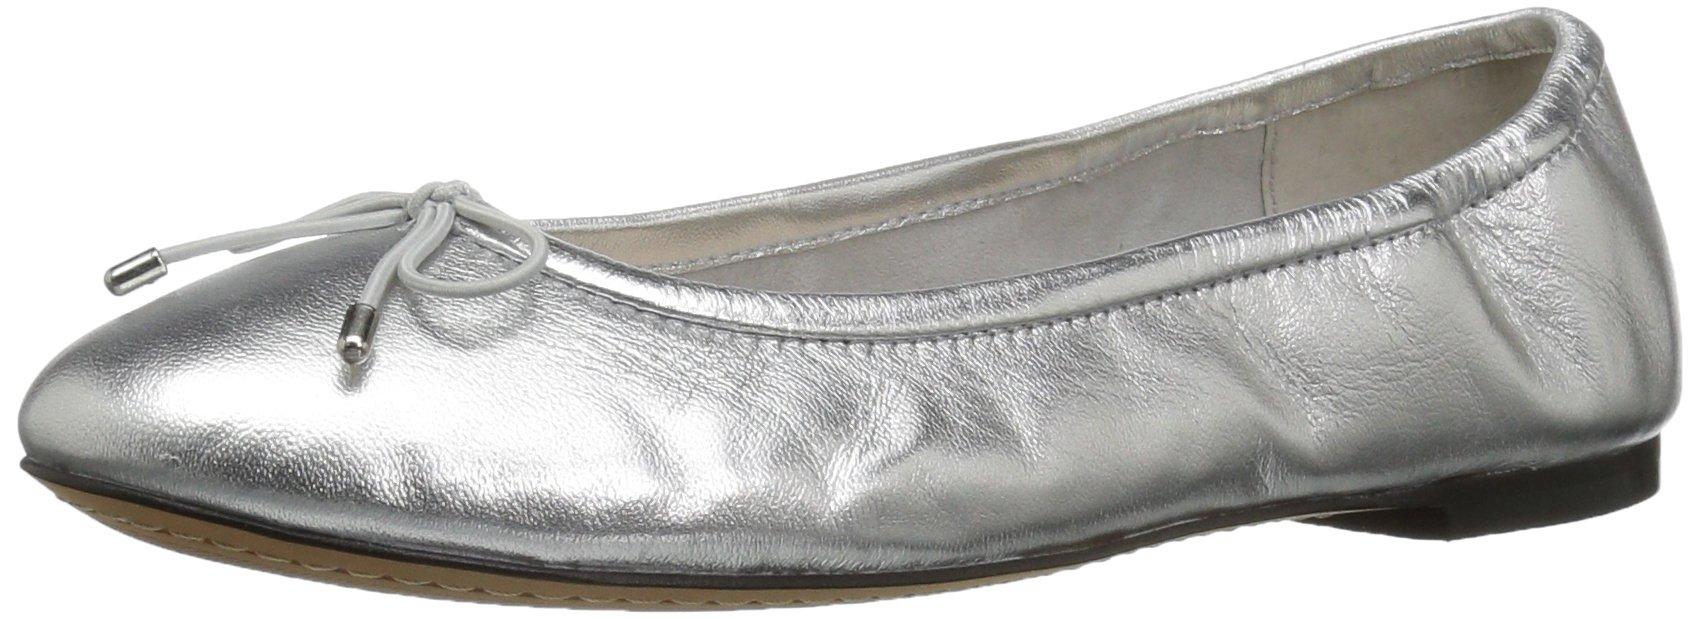 206 Collective Women's Madison Ballet Flat, Silver/Metallic, 10.5 B US